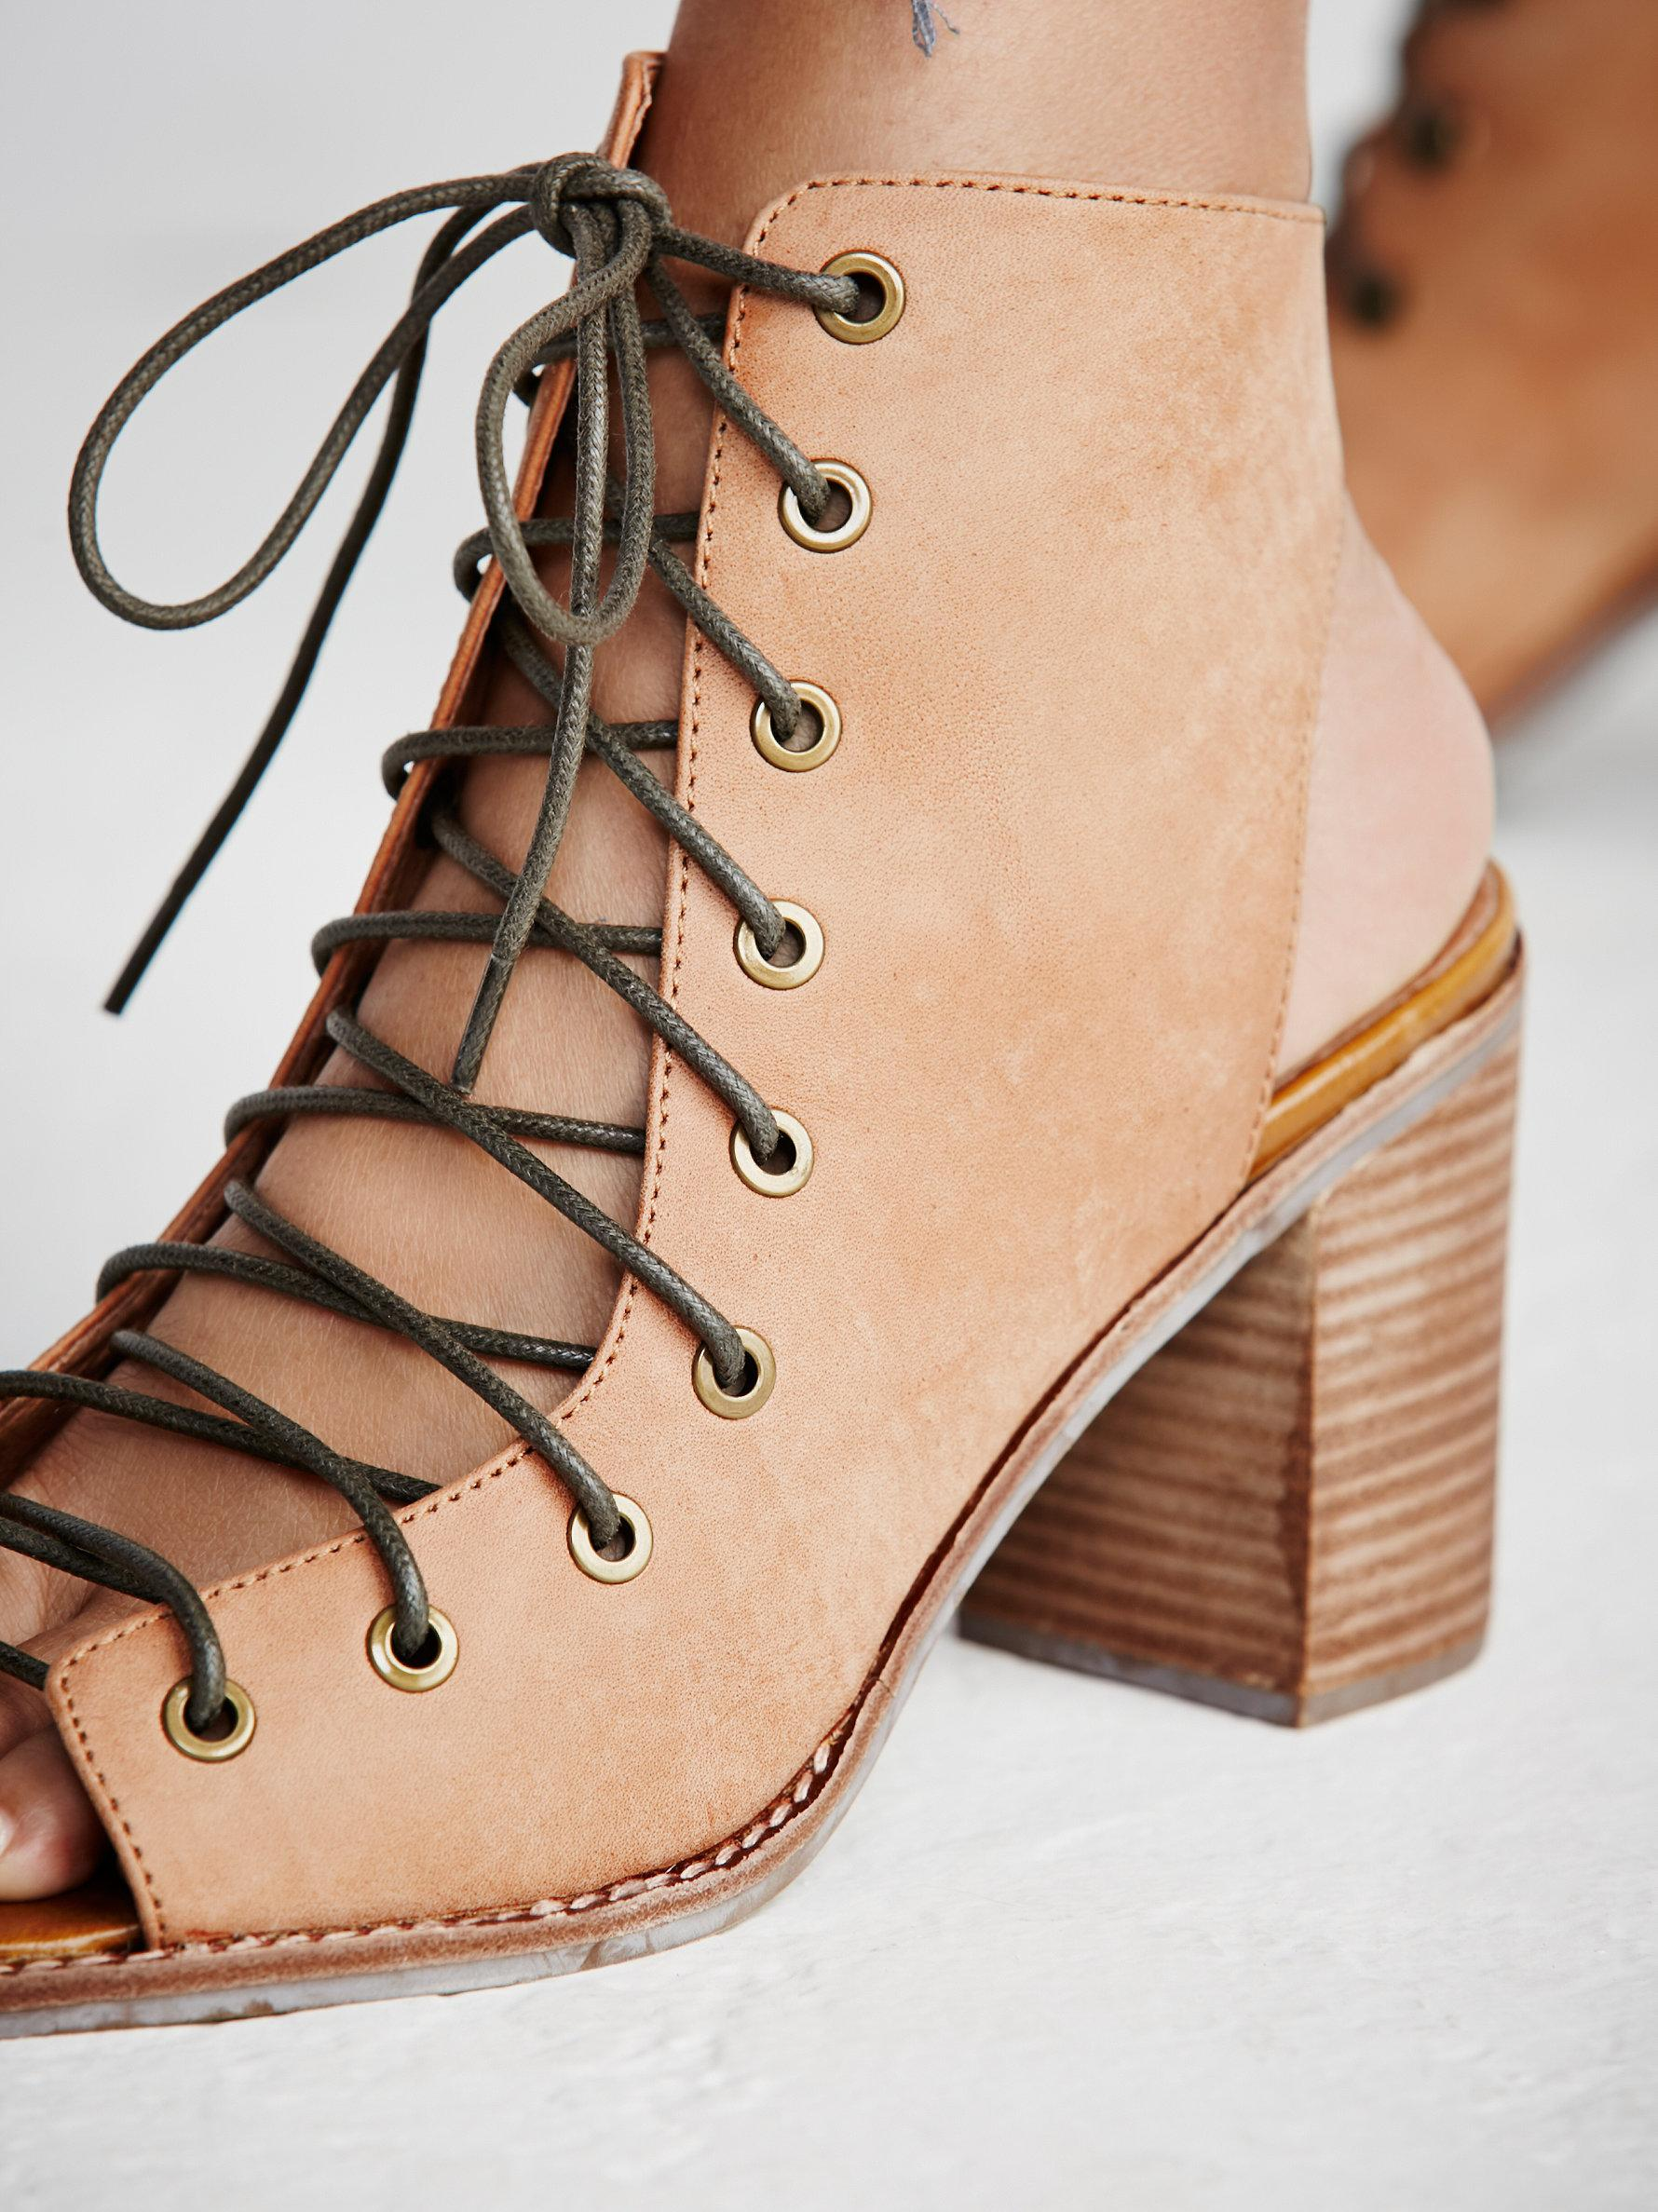 b8591b0324e Minimal Lace Up Heel - Red Heels Vip